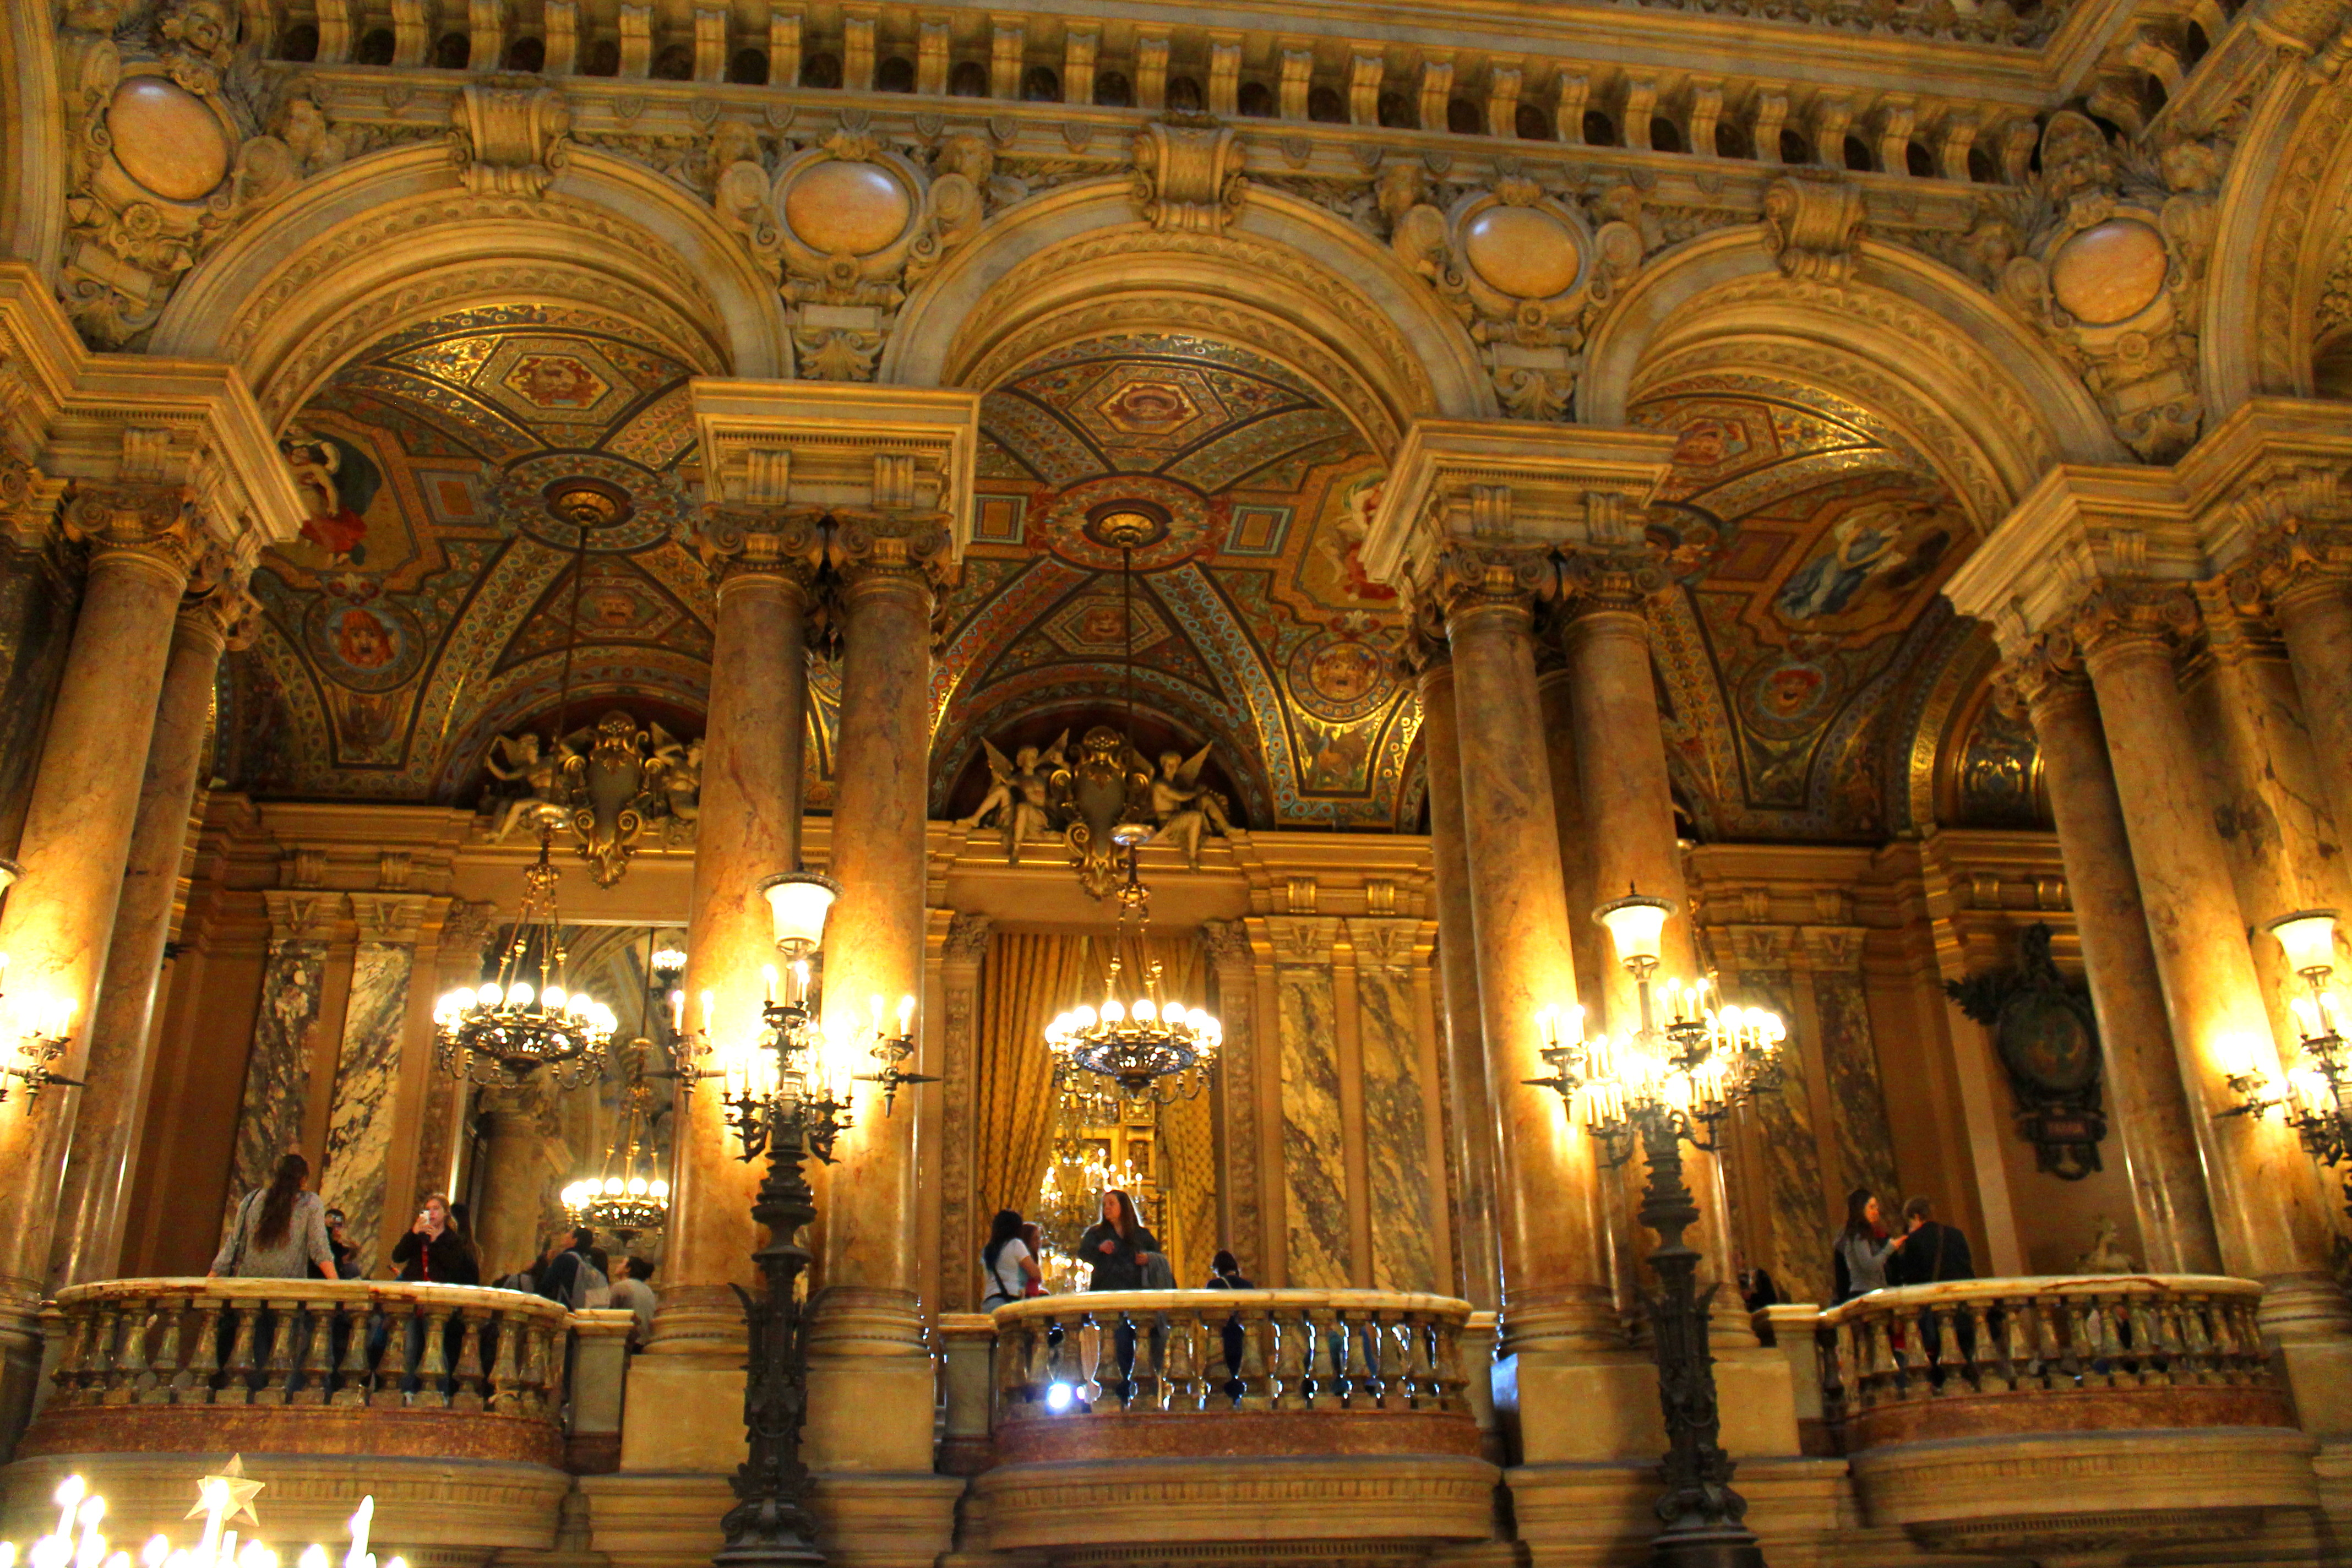 страны архитектура гранд опера париж франция  № 3971724 бесплатно